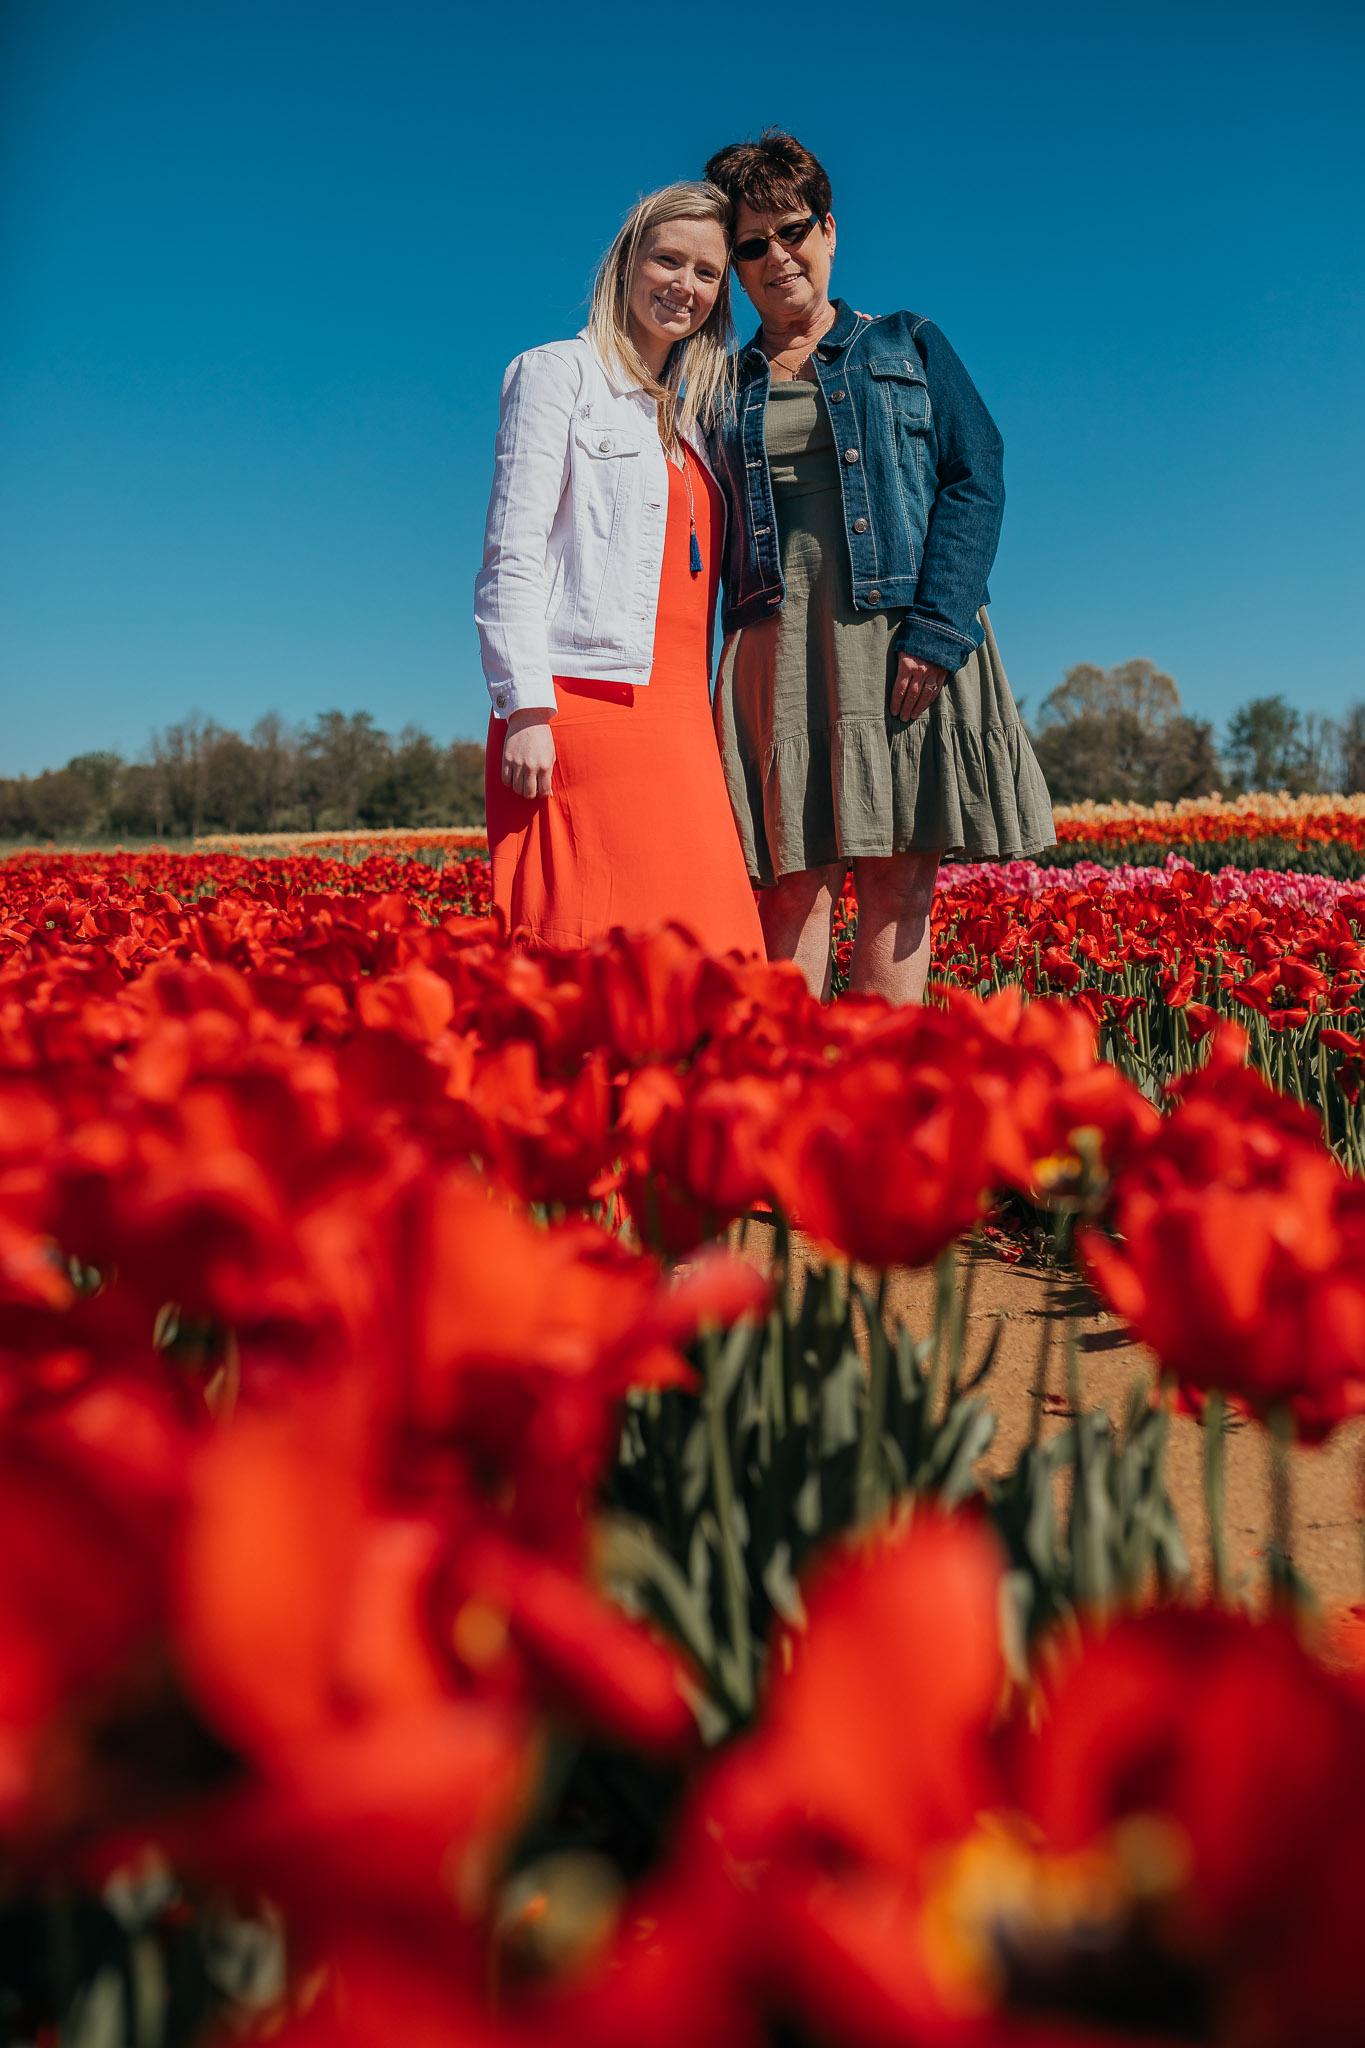 Tulips-4796.jpg